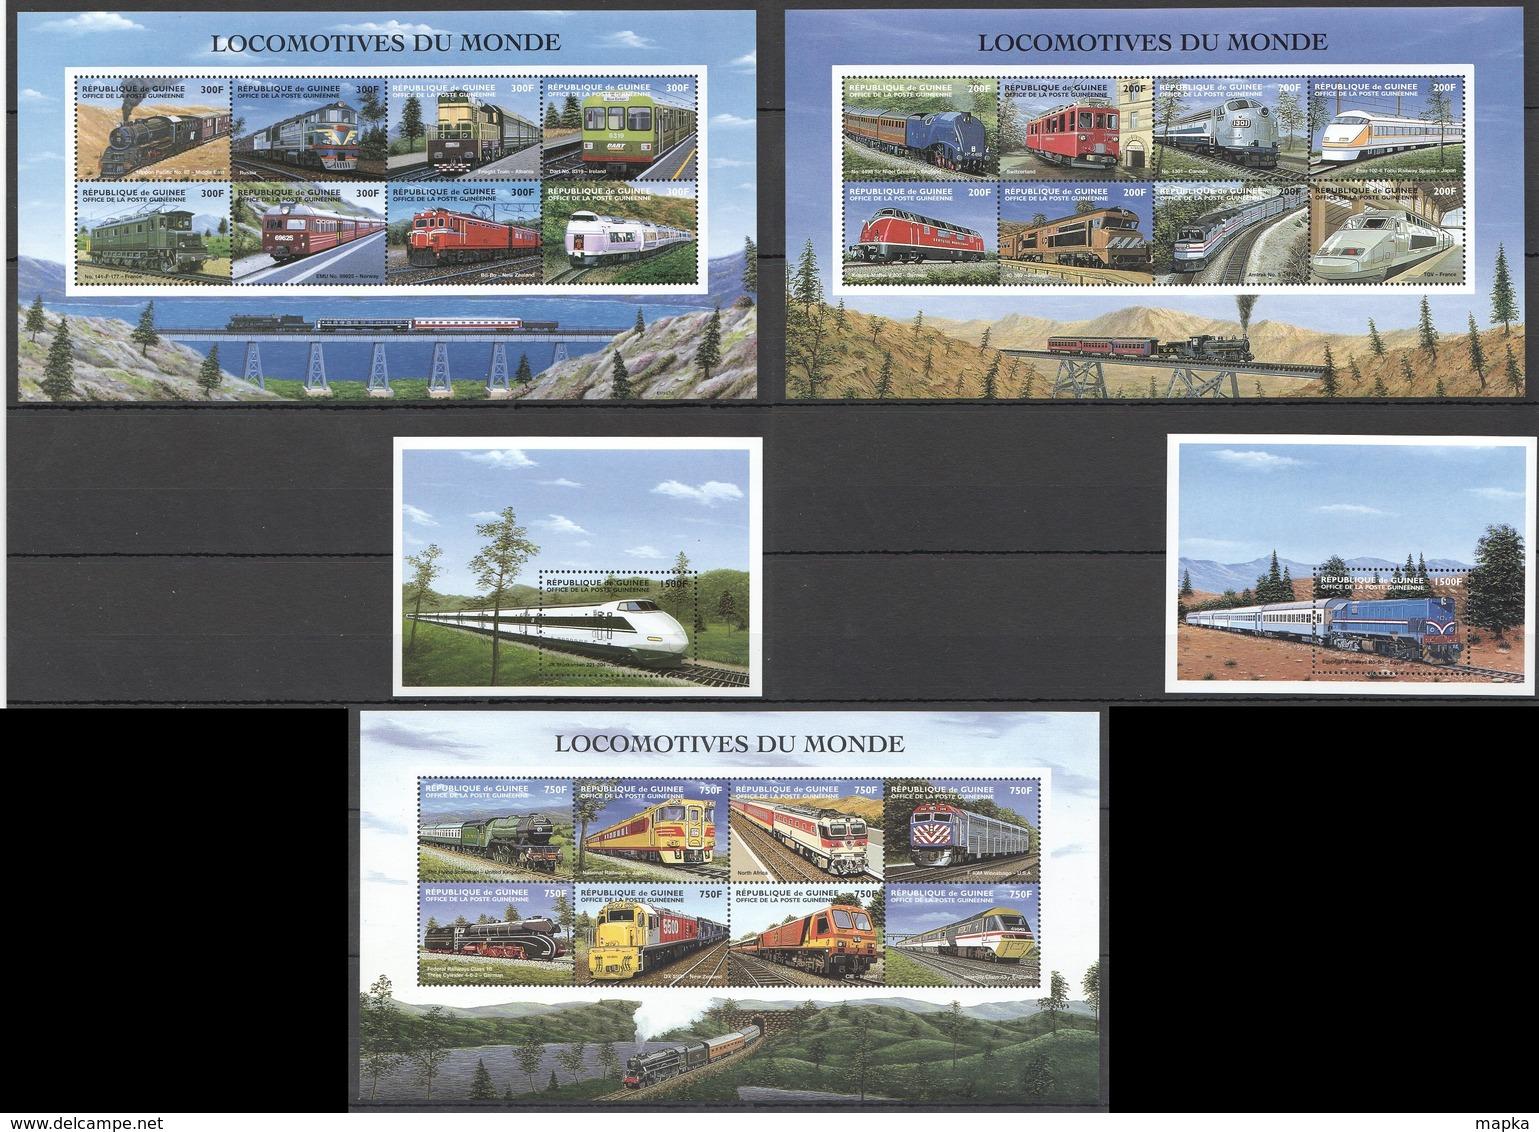 V357 DE GUINEE TRANSPORTATION TRAINS LOCOMOTIVES DU MONDE 3KB+2BL MNH - Treinen